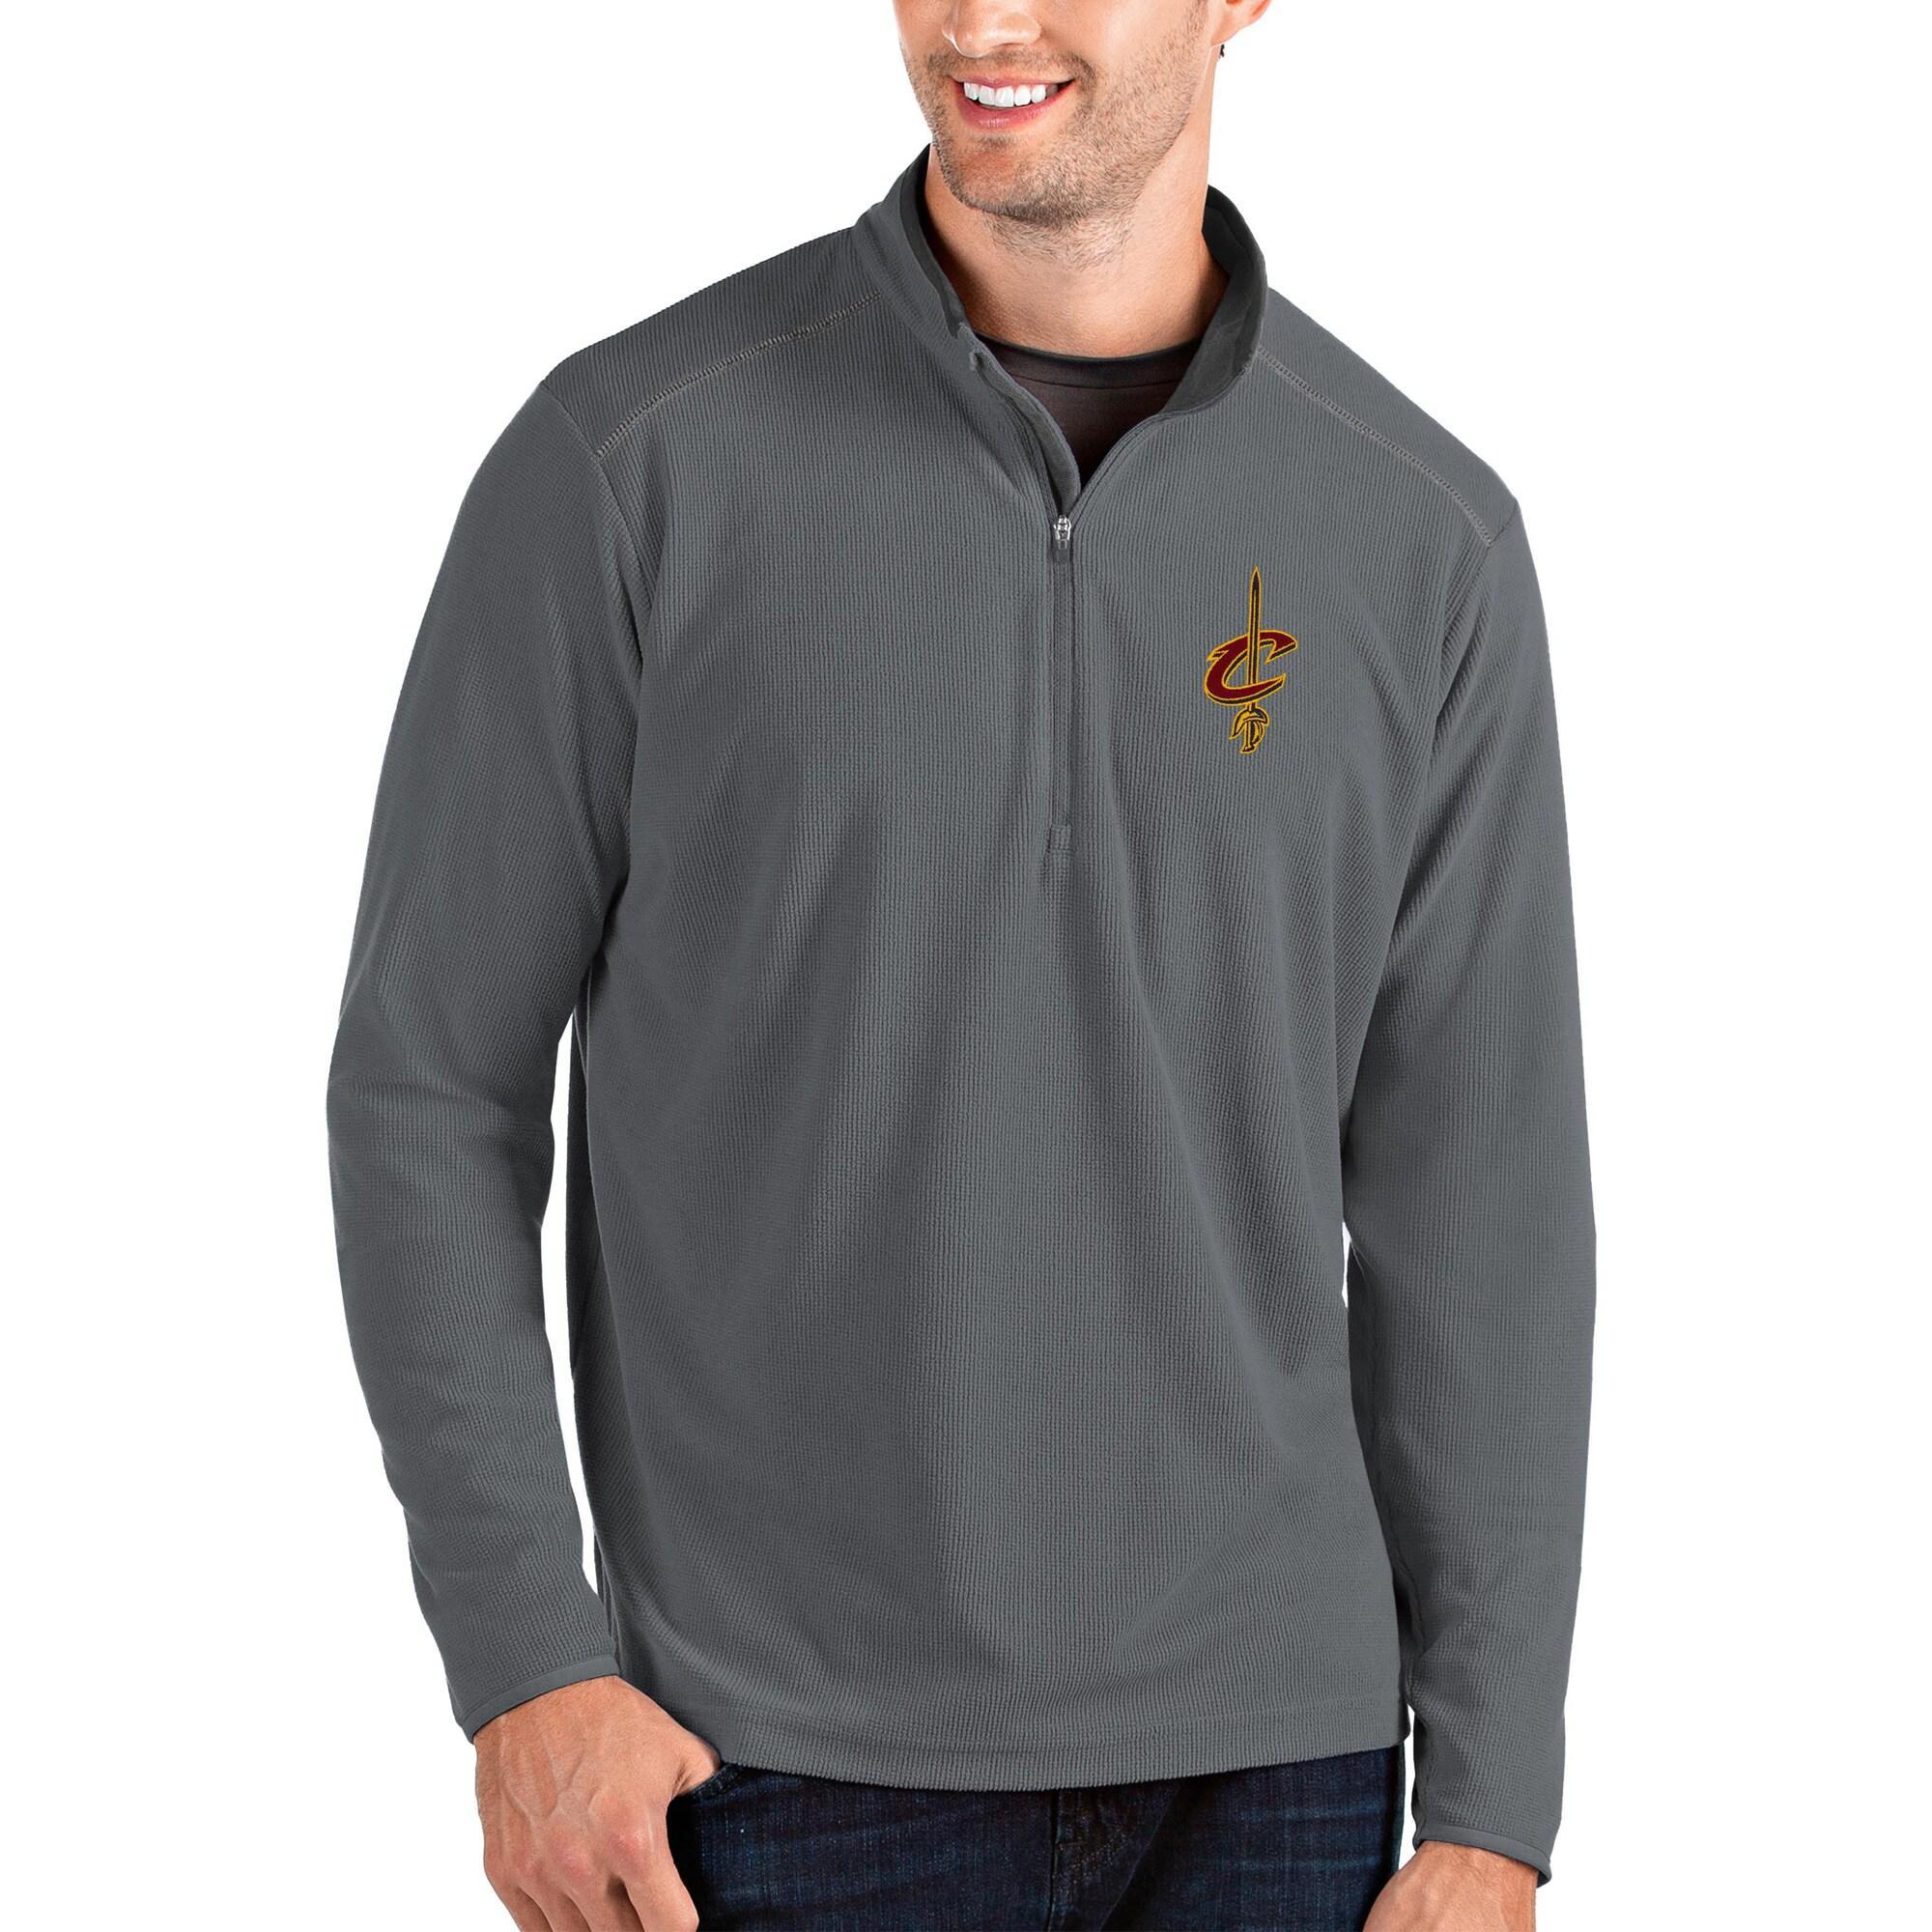 Cleveland Cavaliers Antigua Glacier Quarter-Zip Pullover Jacket - Charcoal/Gray